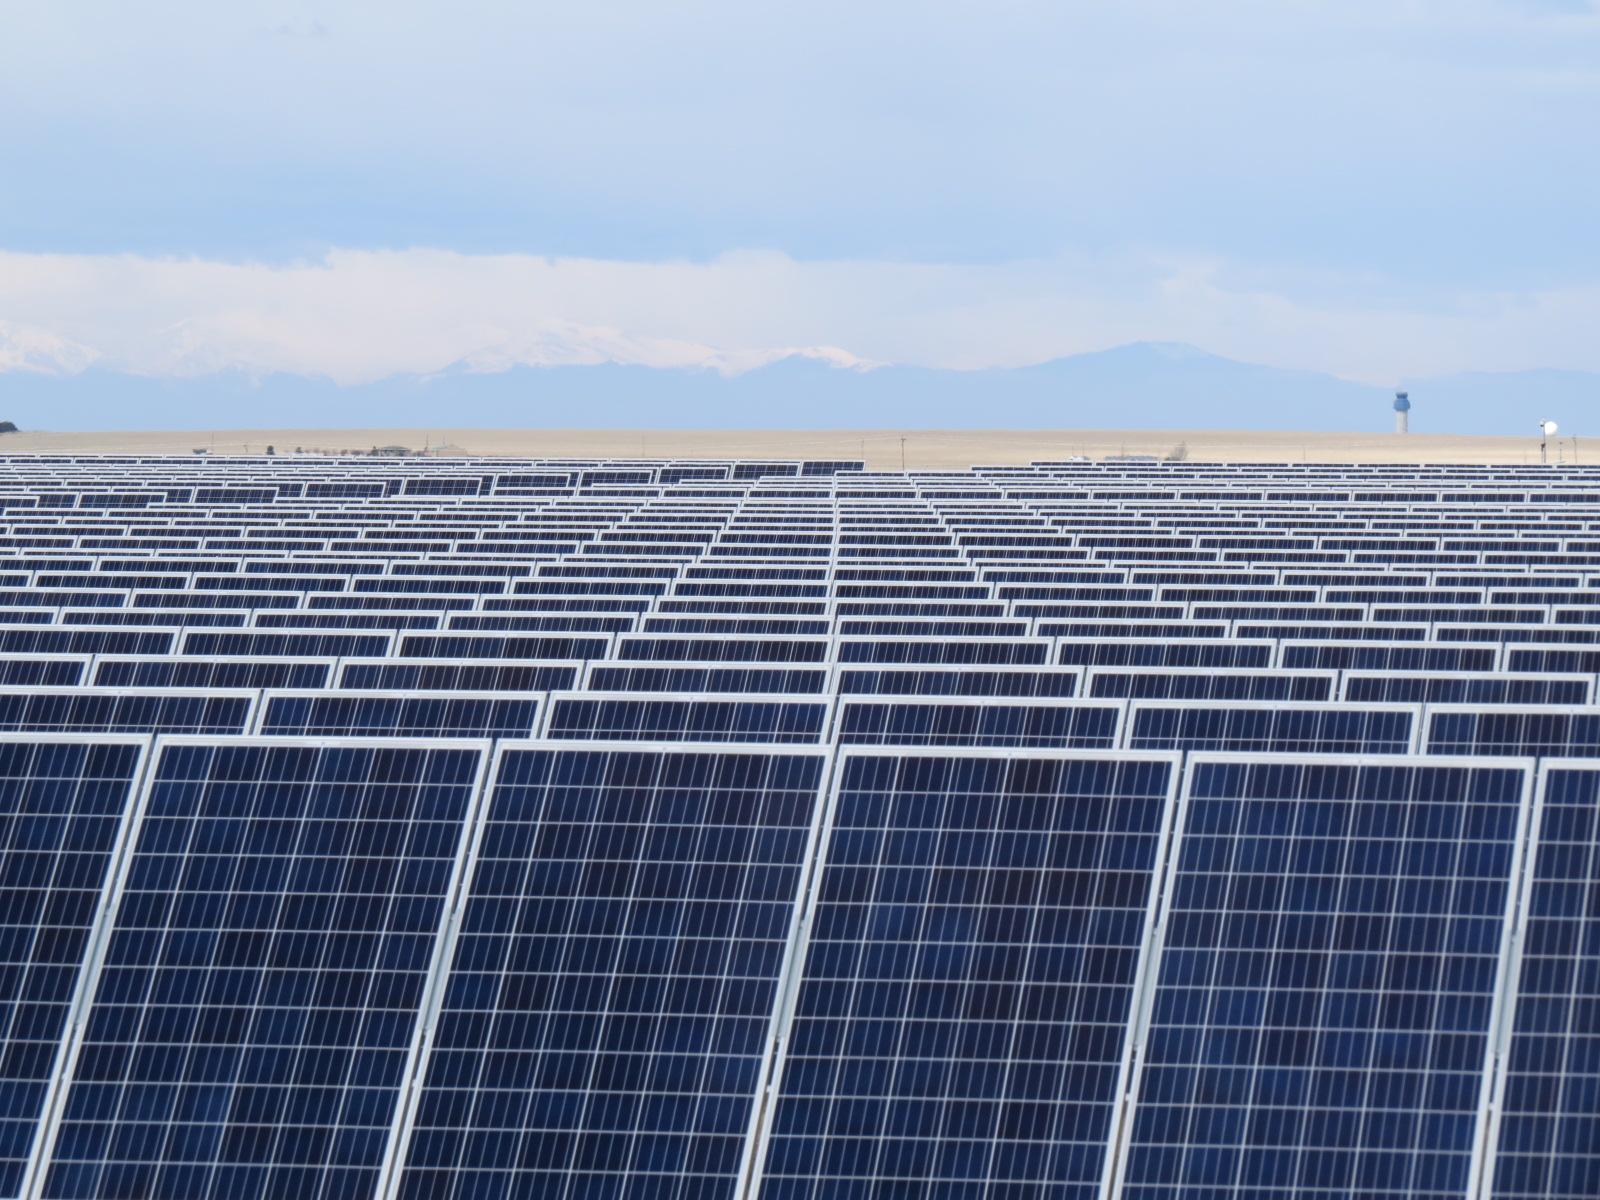 Victory Solar panels pic 16.JPG